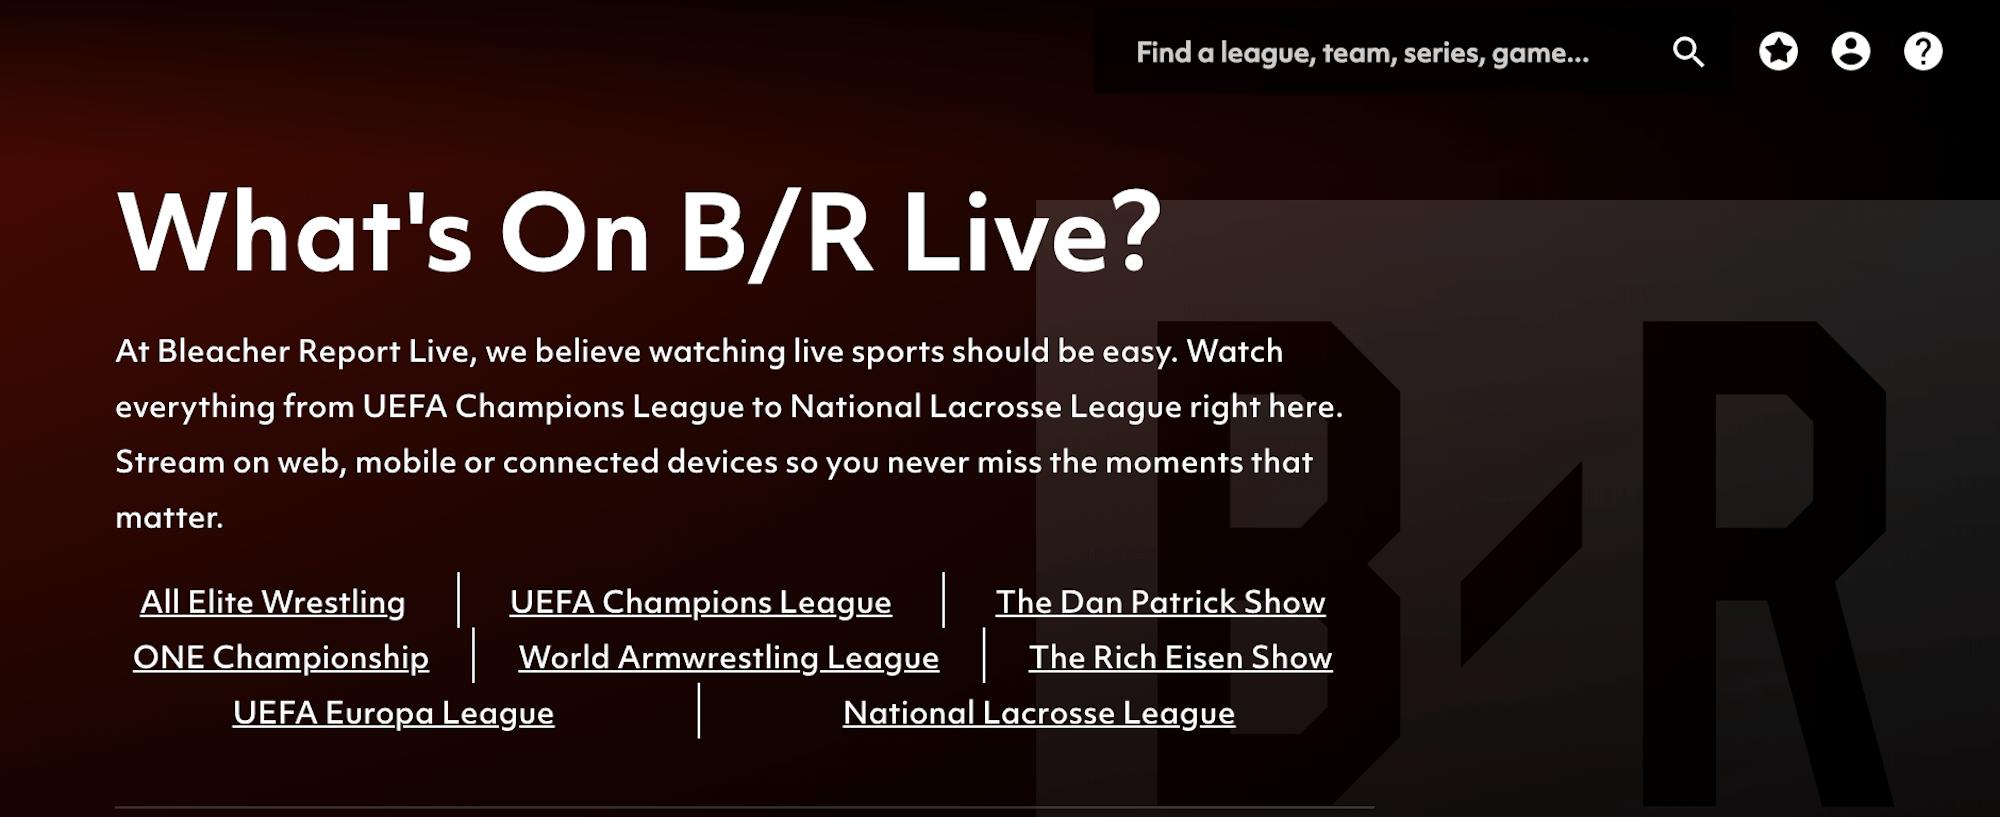 2019-20 uefa champions league atletico madrid vs bayer leverkusen soccer live stream free b-r live